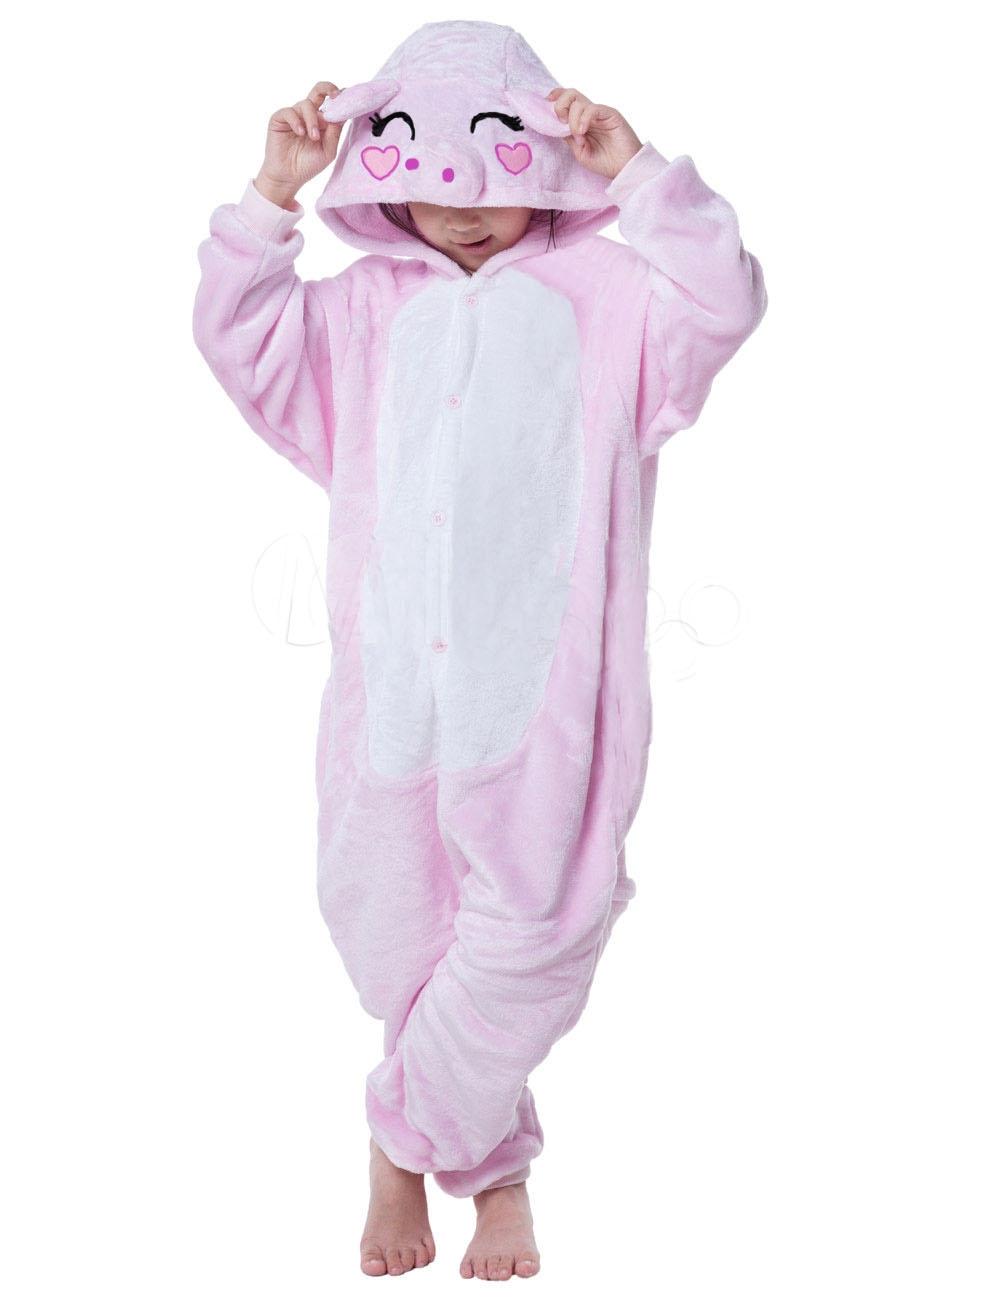 Детская пижама кигуруми Хрюшка (28) детская пижама кигуруми хрюшка 26